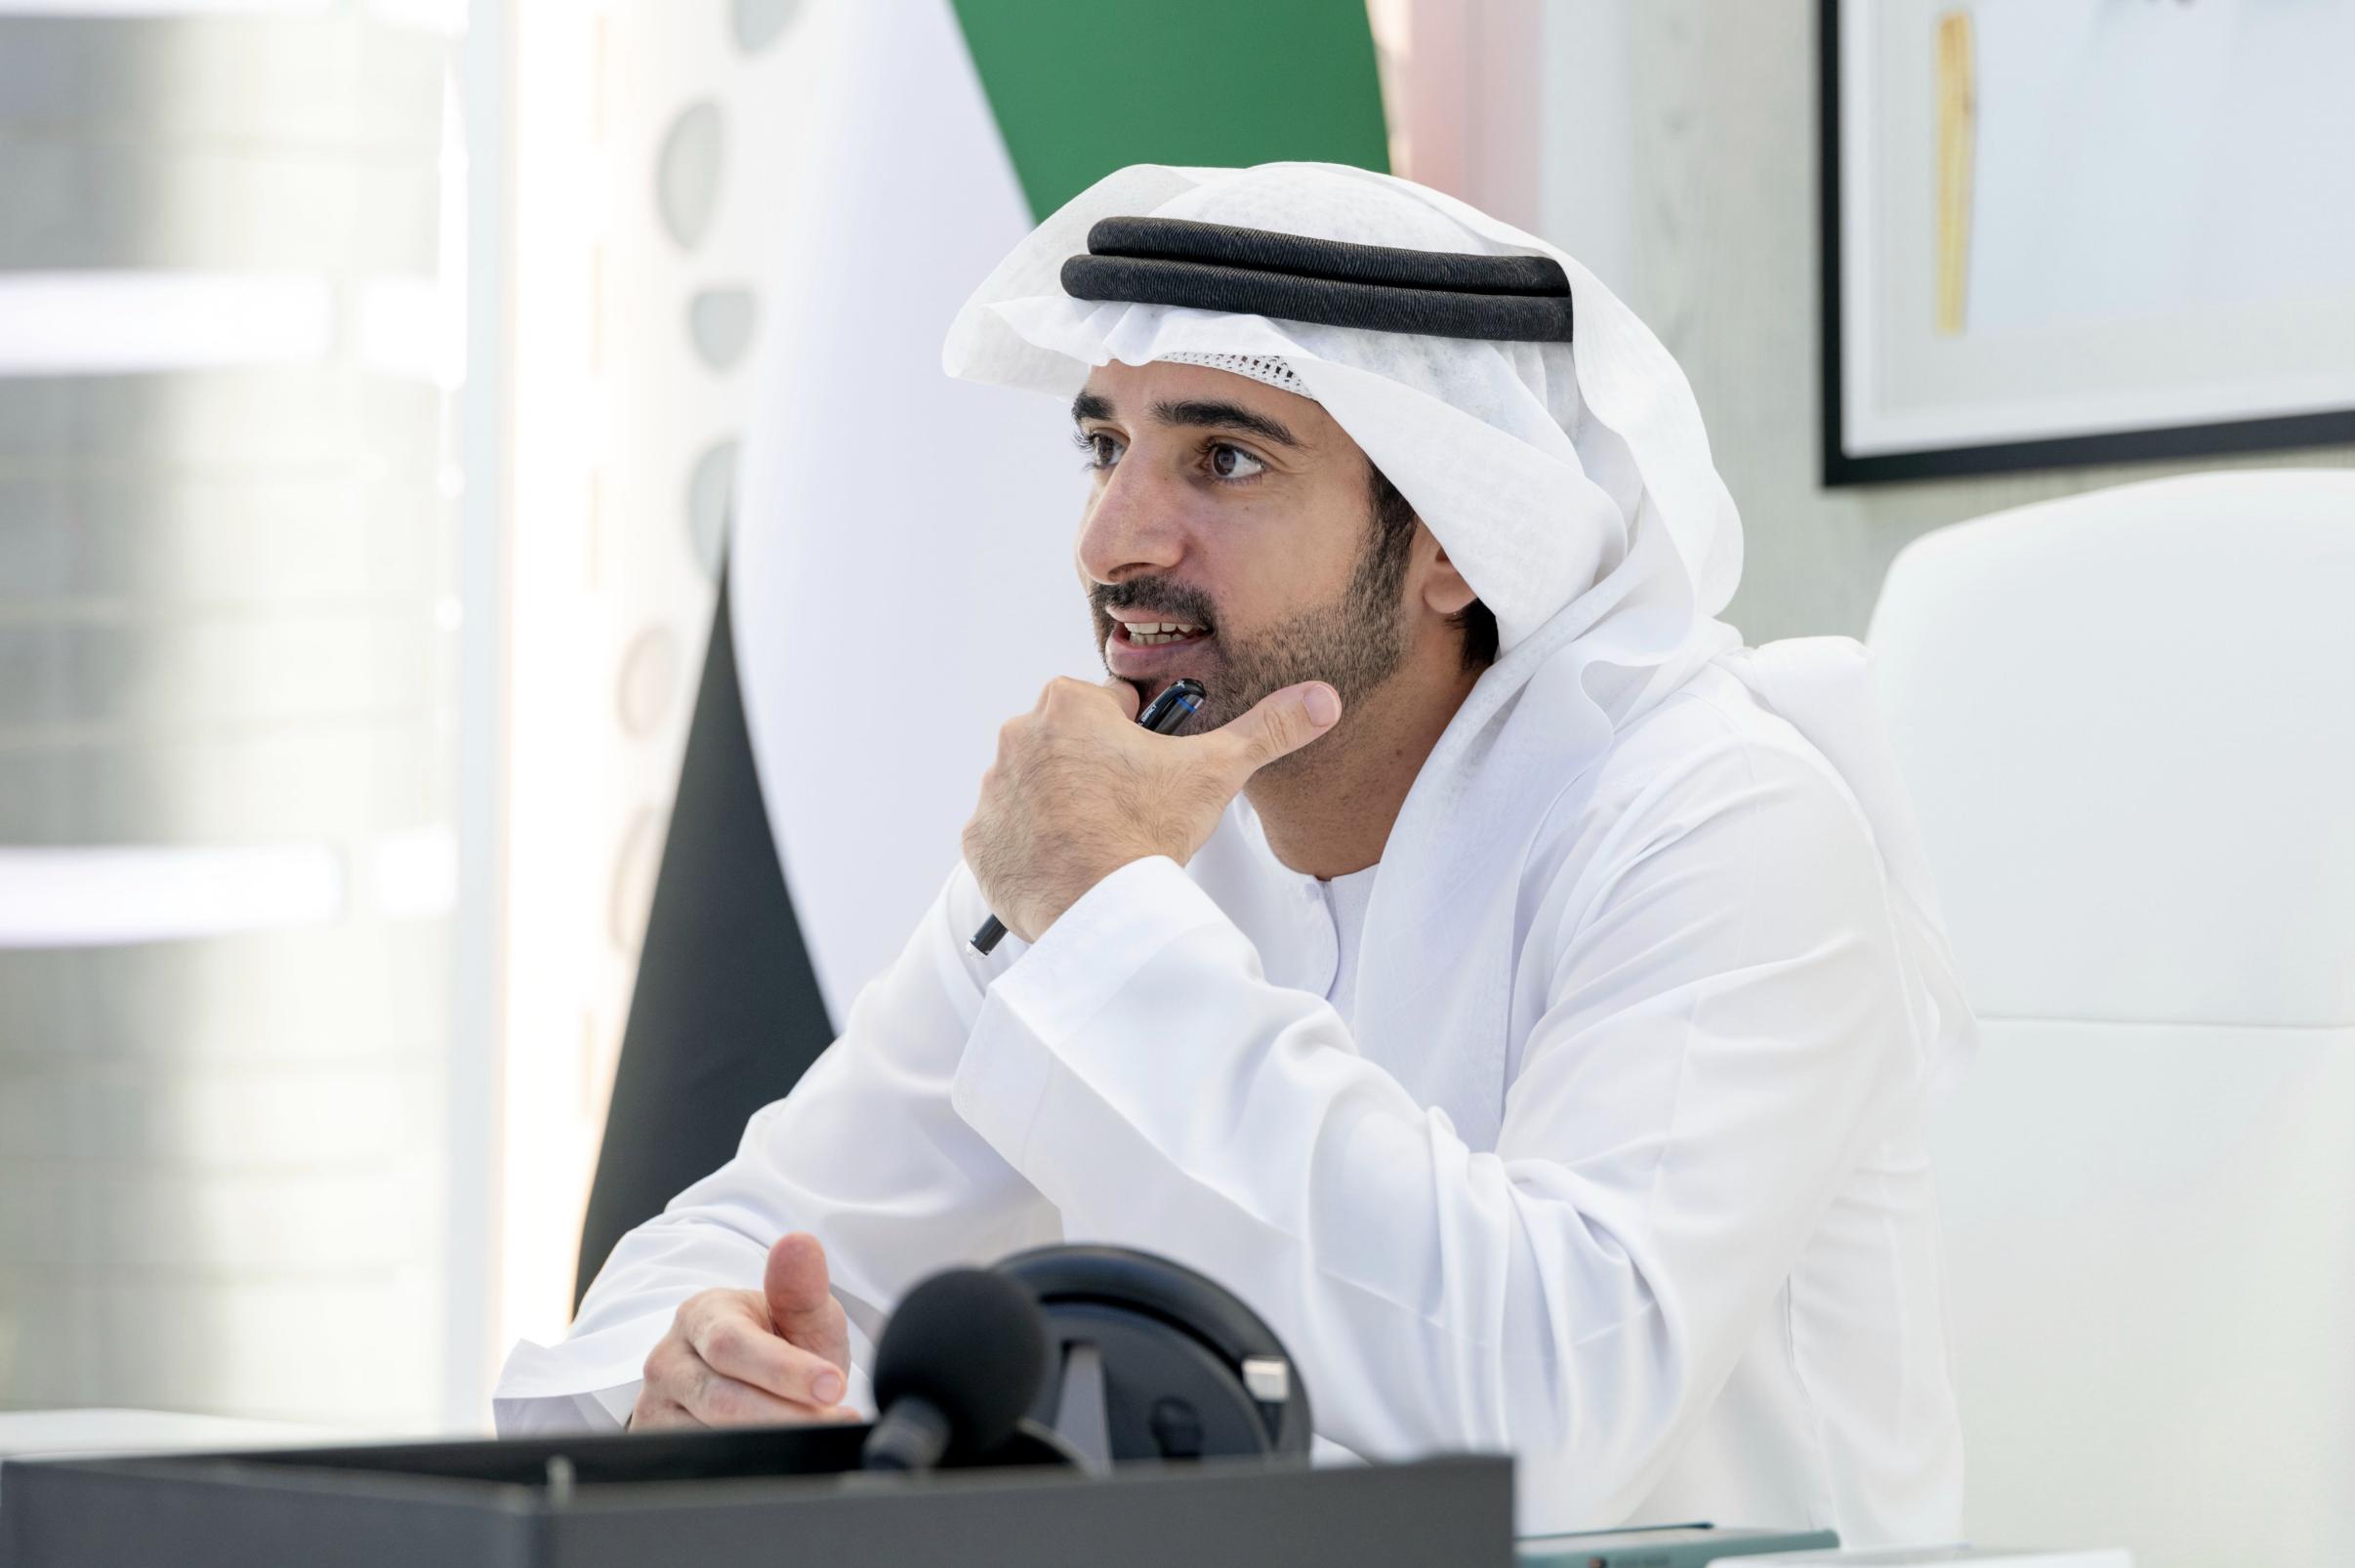 Dubai's foreign trade grows 10% in Q1: Sheikh Hamdan